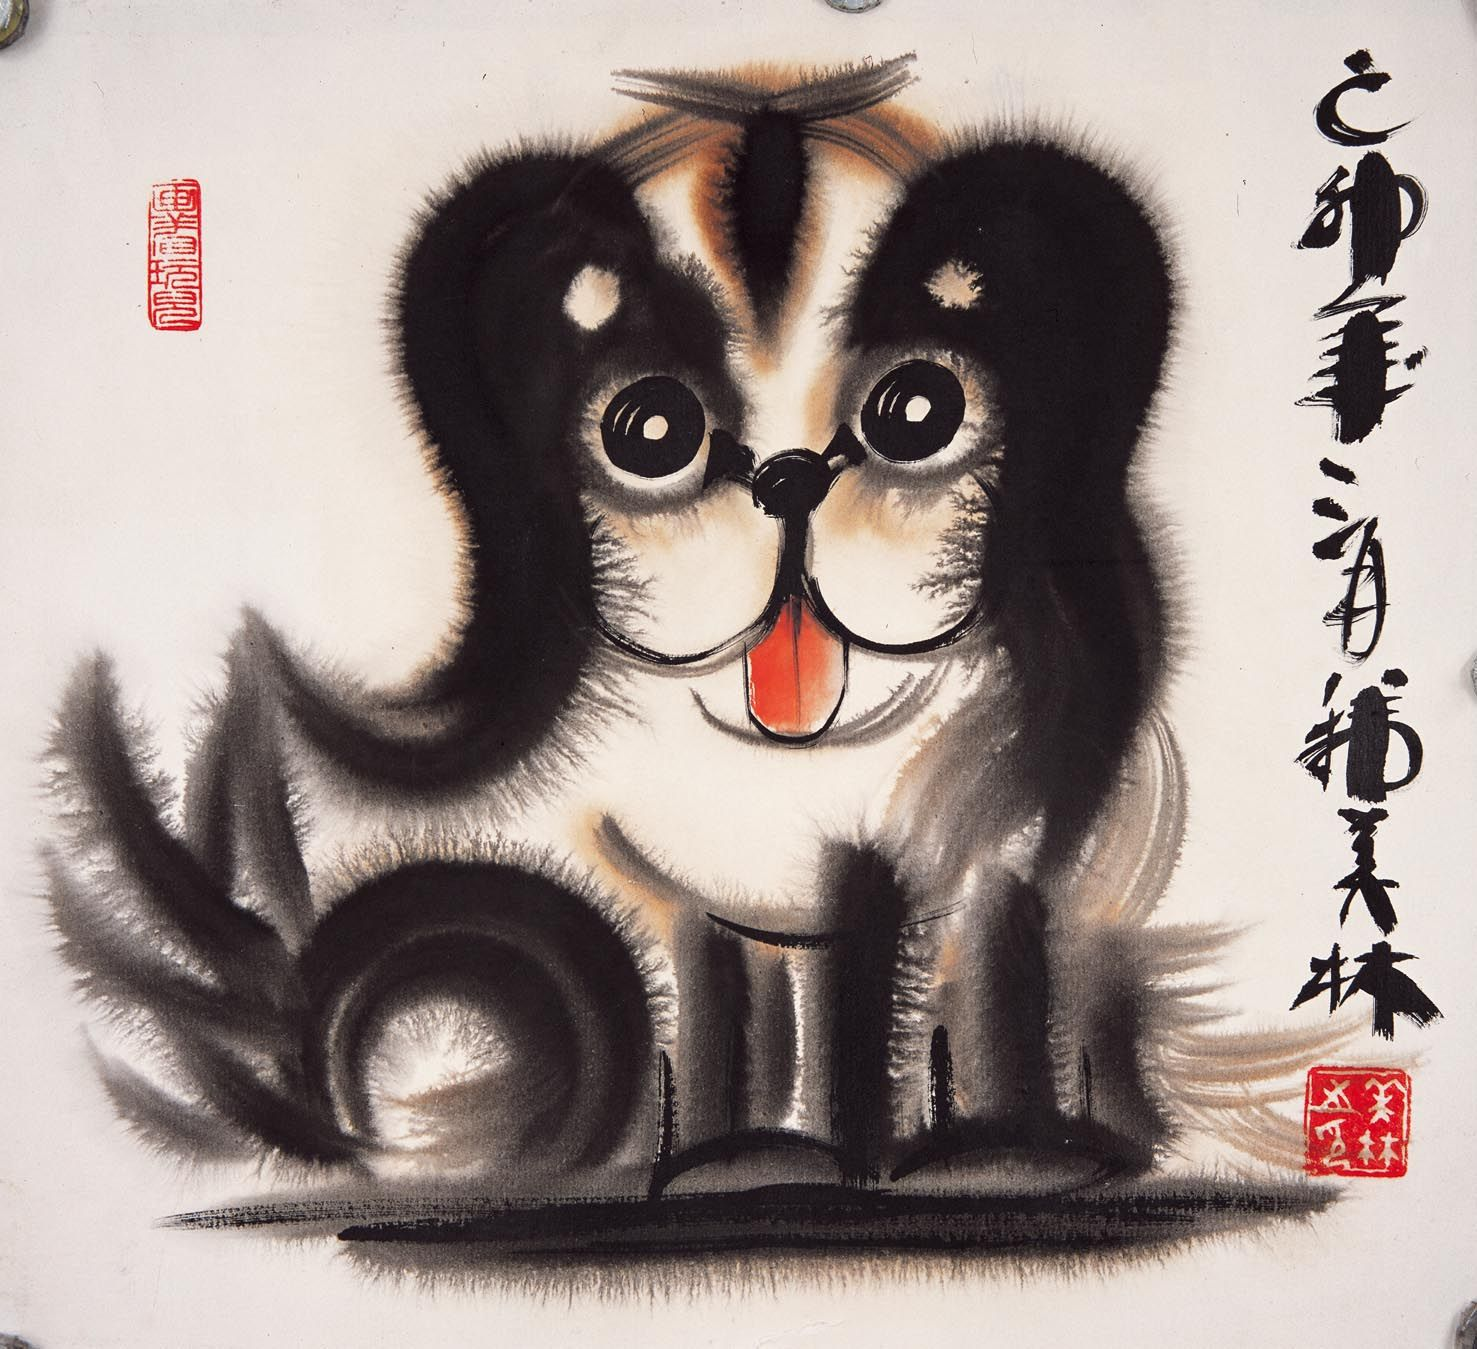 韩美林动物画② - 潮河边人的日志- 网易博客 Kid Art, Art For Kids, Chinese Brush, Chinese Painting, Ink Painting, Asian Art, China, Paintings, Contemporary